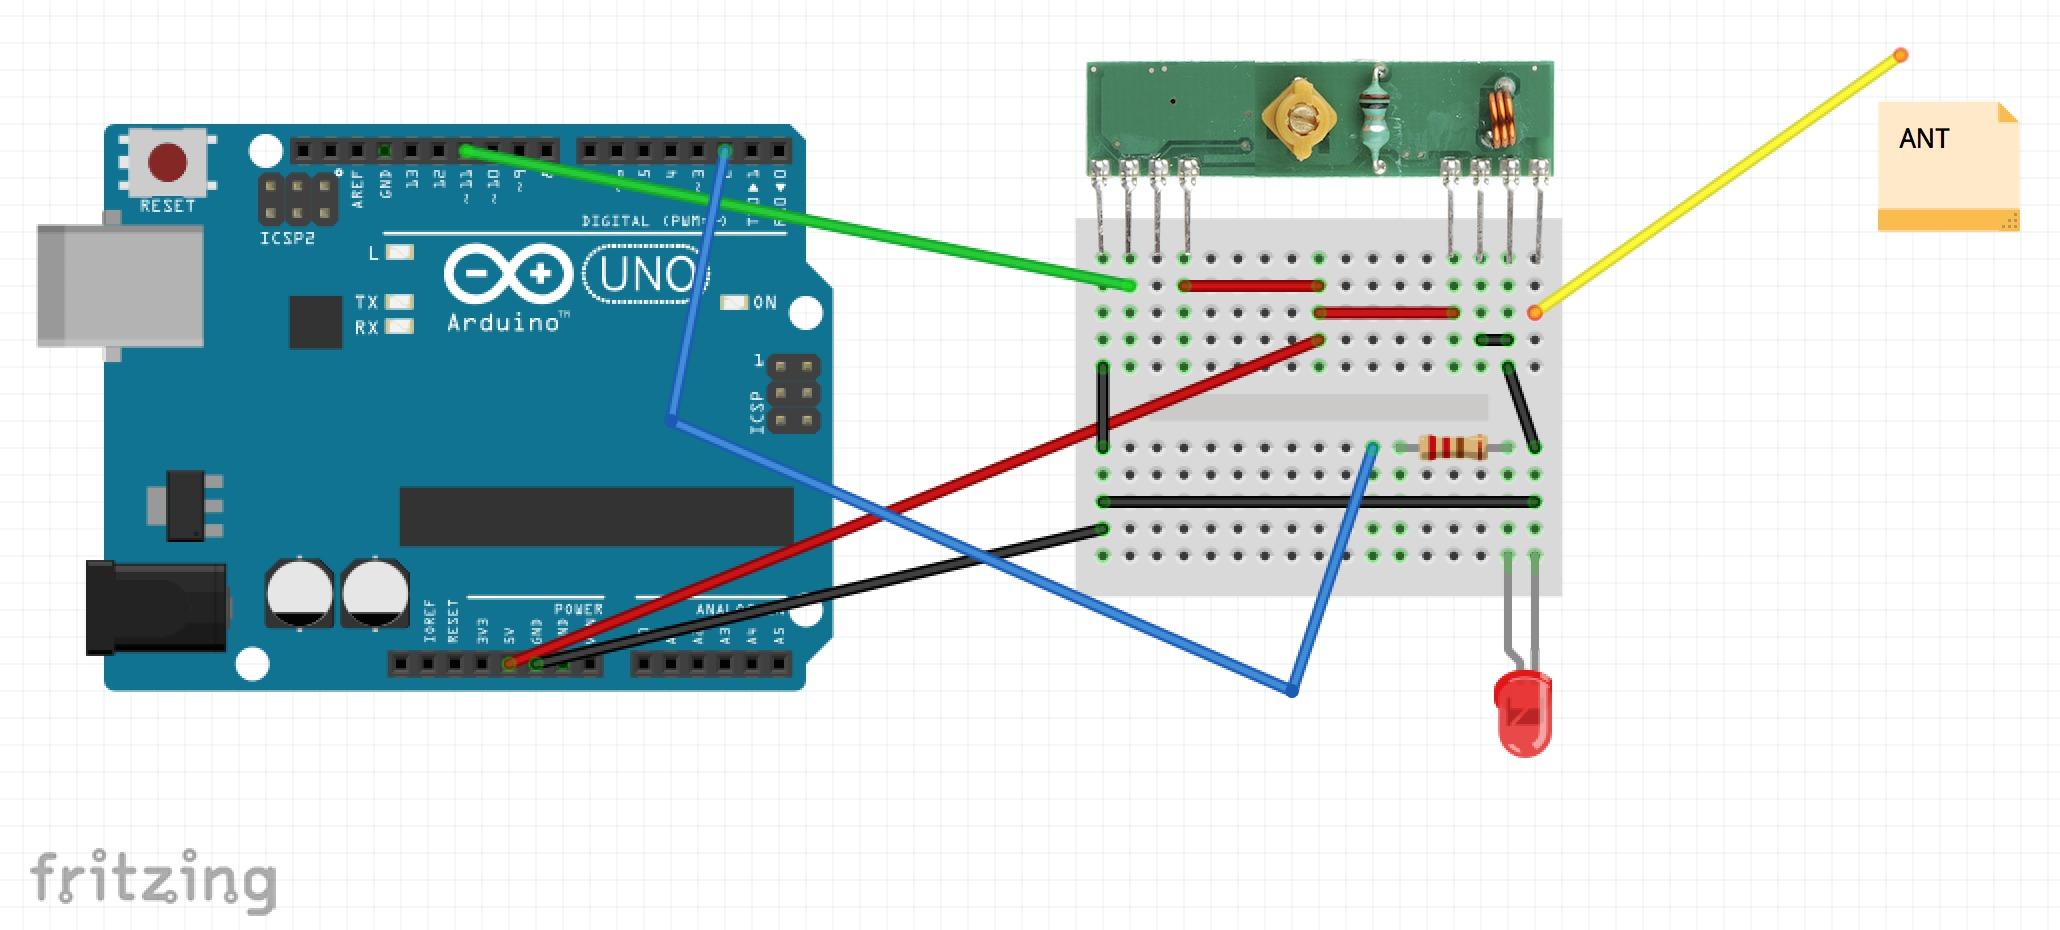 Aaron Ardiri - IoT Blog: RF 433Mhz radio communication with an Arduino